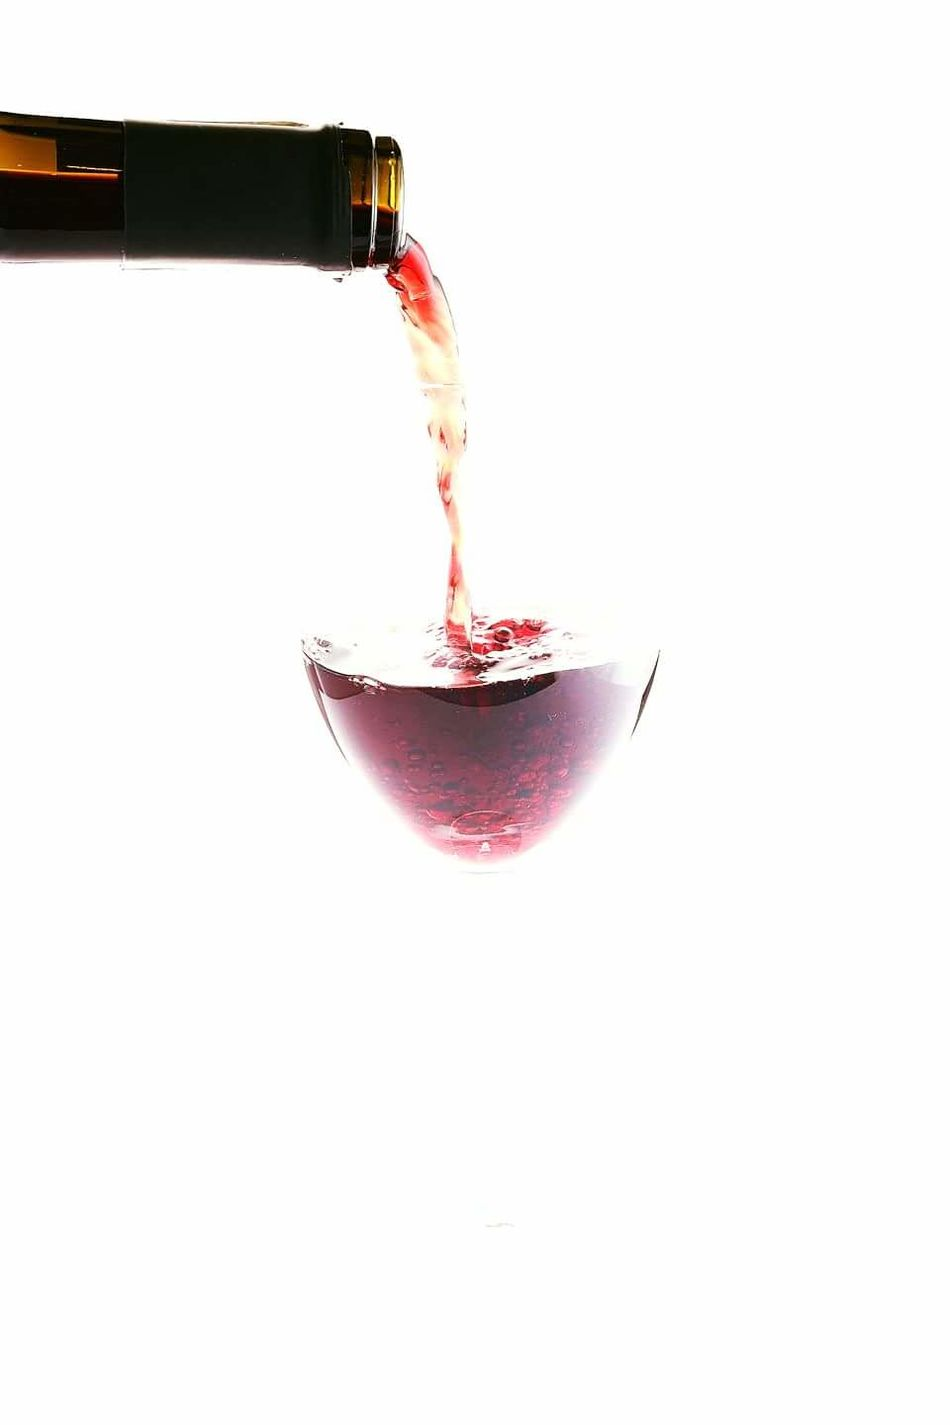 Splashing Alcohol Drink Food And Drink Motion Drinking Glass Wine Impact No People White Background Redwine Photoshoot Studio Photography Photostudio Studiophotography Conceptual Portrait Photooftheday